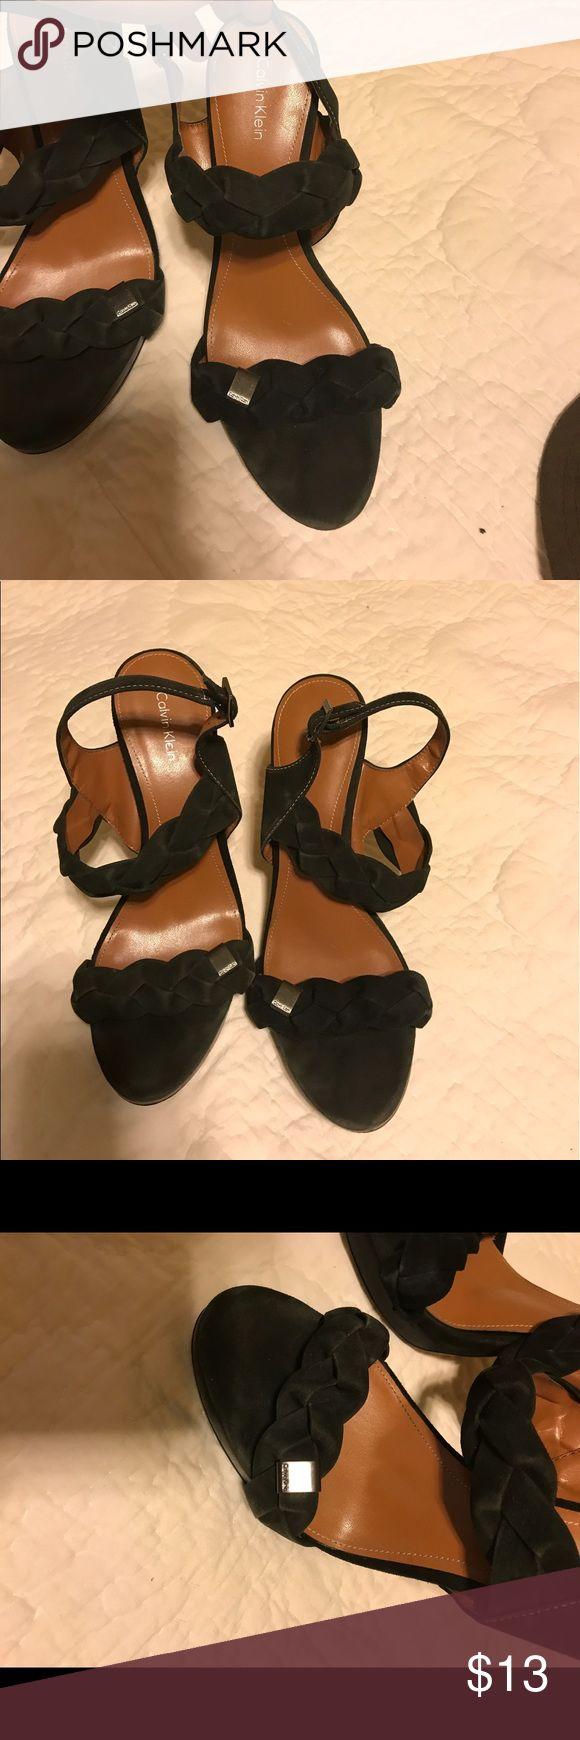 Calvin Klein Black Suede Heels Good condition. Worn once for a wedding Calvin Klein Shoes Heels